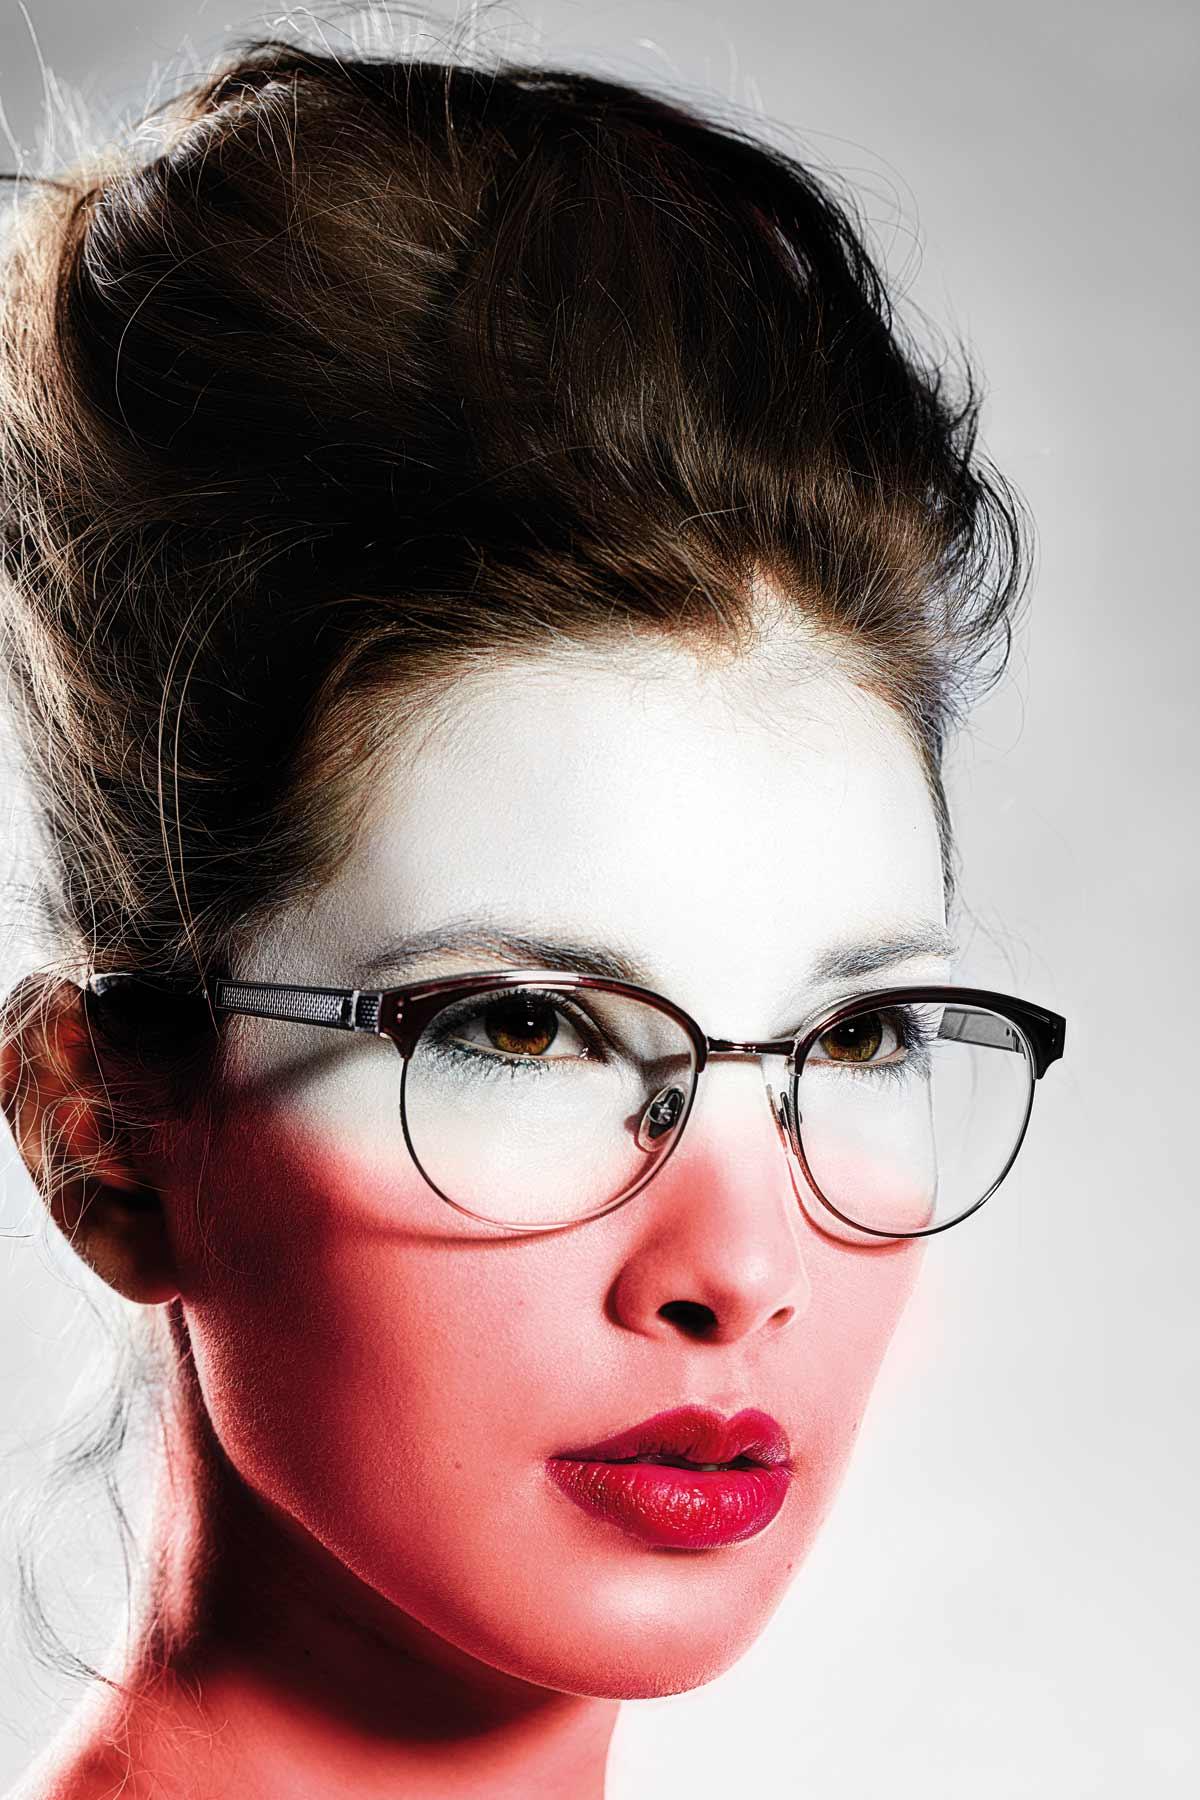 Eyewear Magazine 2011.03.13-people-eyewear-23599-1